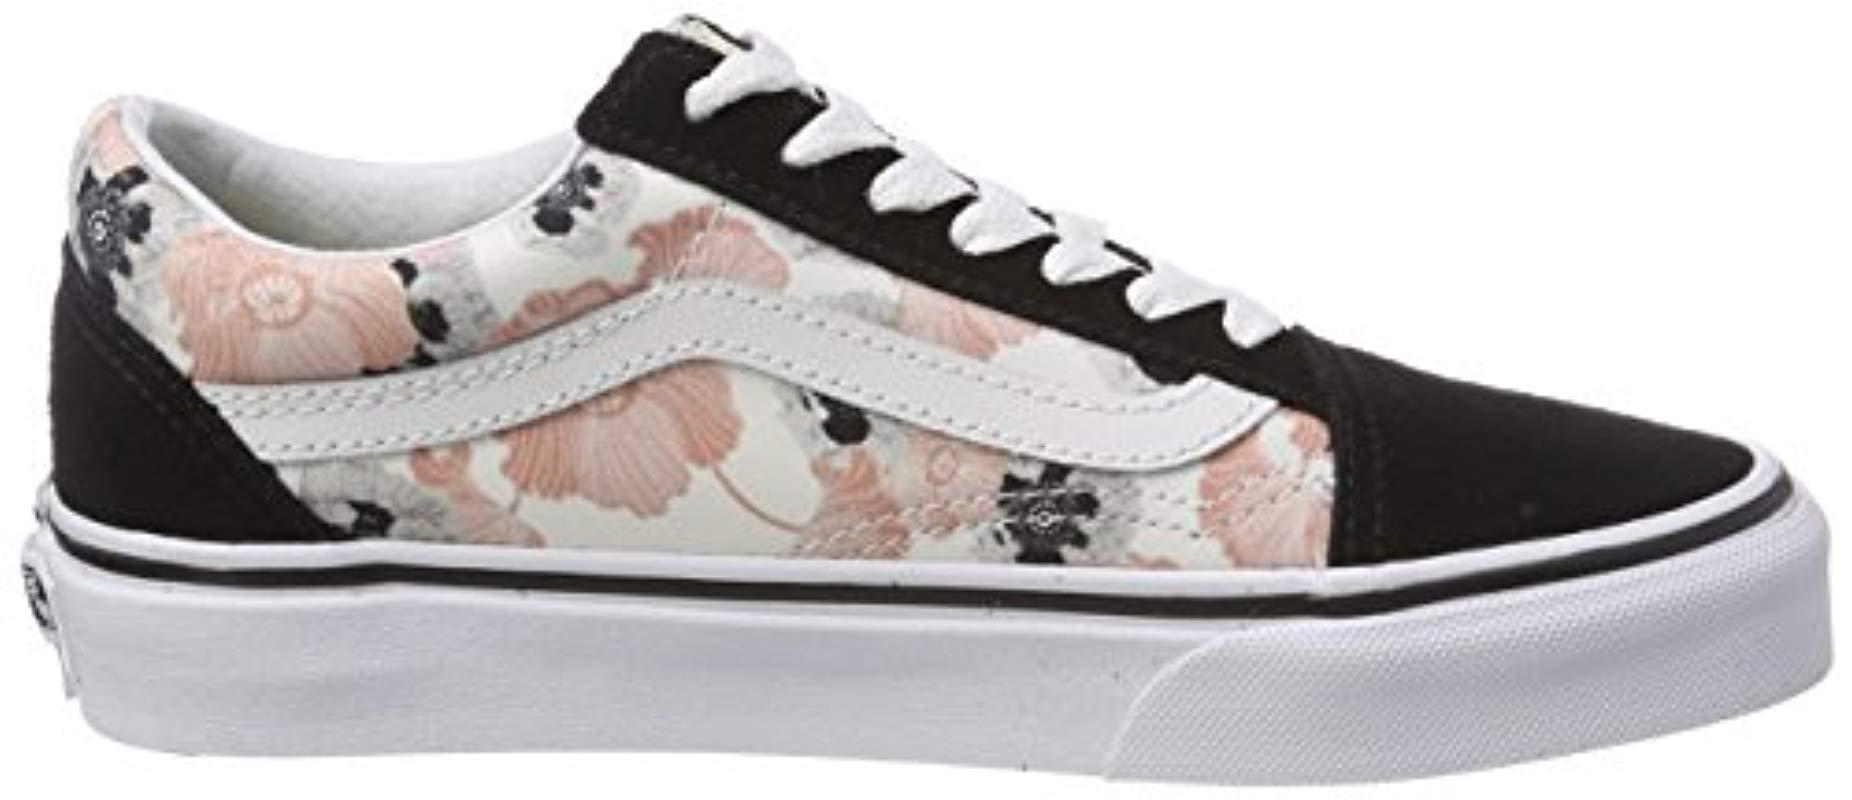 Old Skool, Chaussures de Running Femme Vans en coloris Noir - Lyst